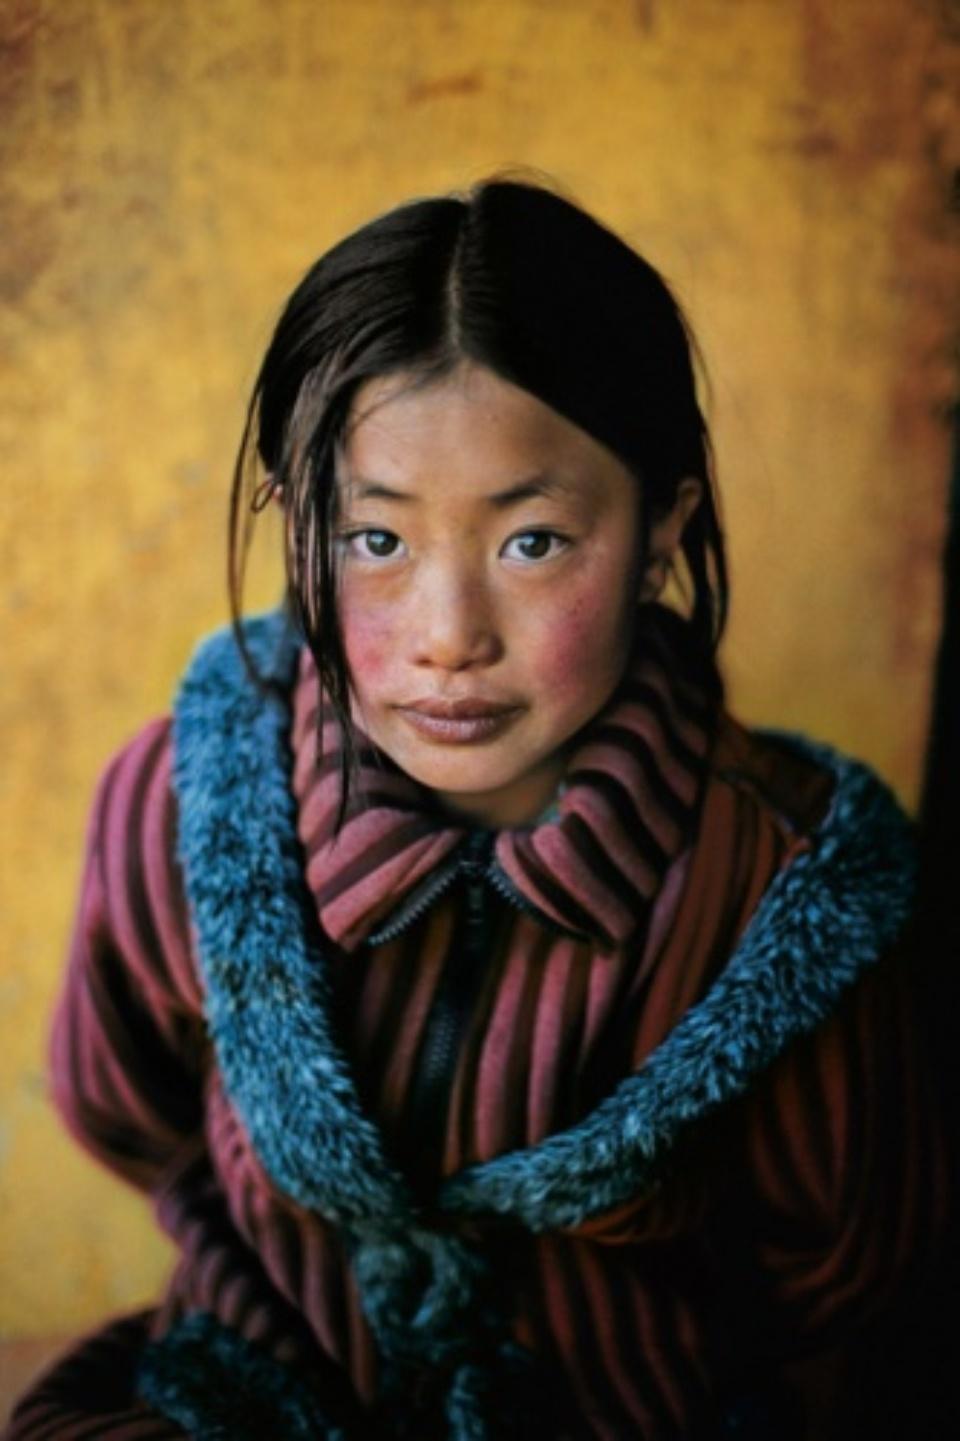 Steve McCurry: Tibetan Girl with New Coat Tibet, 2001 C-Print 50 x 60 cm // 76 x 101 cm // 101 x 152 cm Editioned